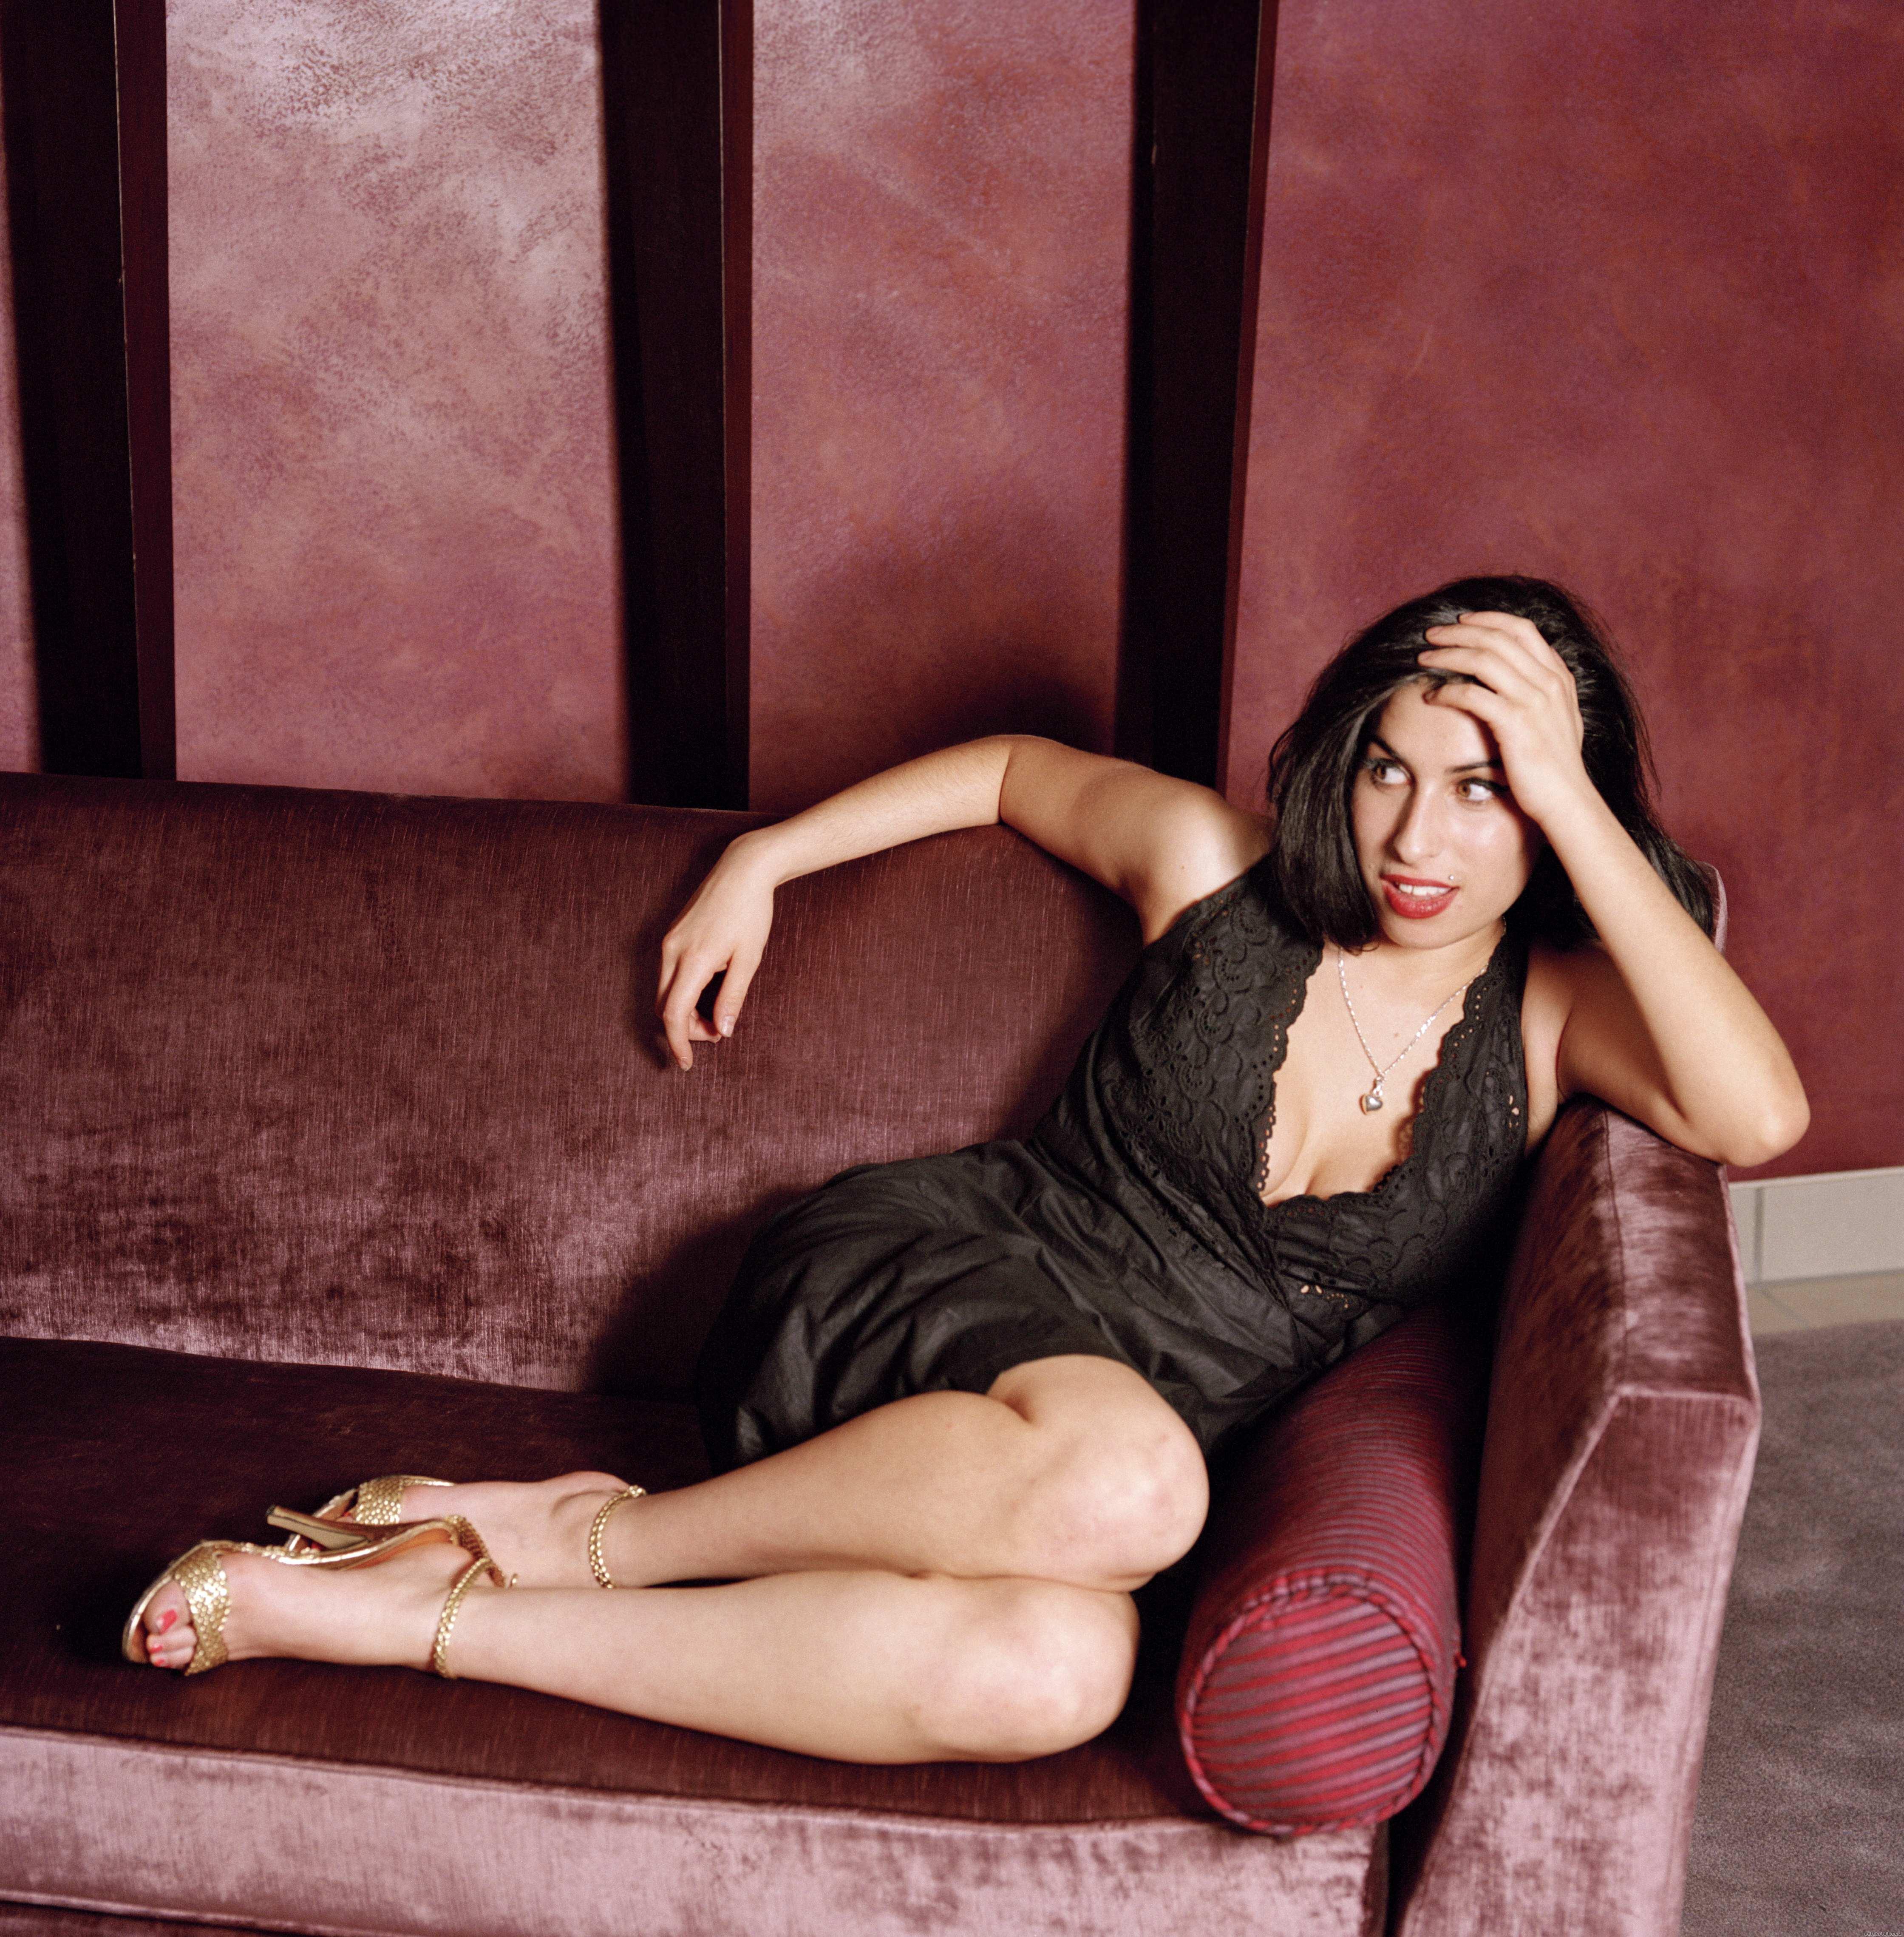 Michele erotic art gallery